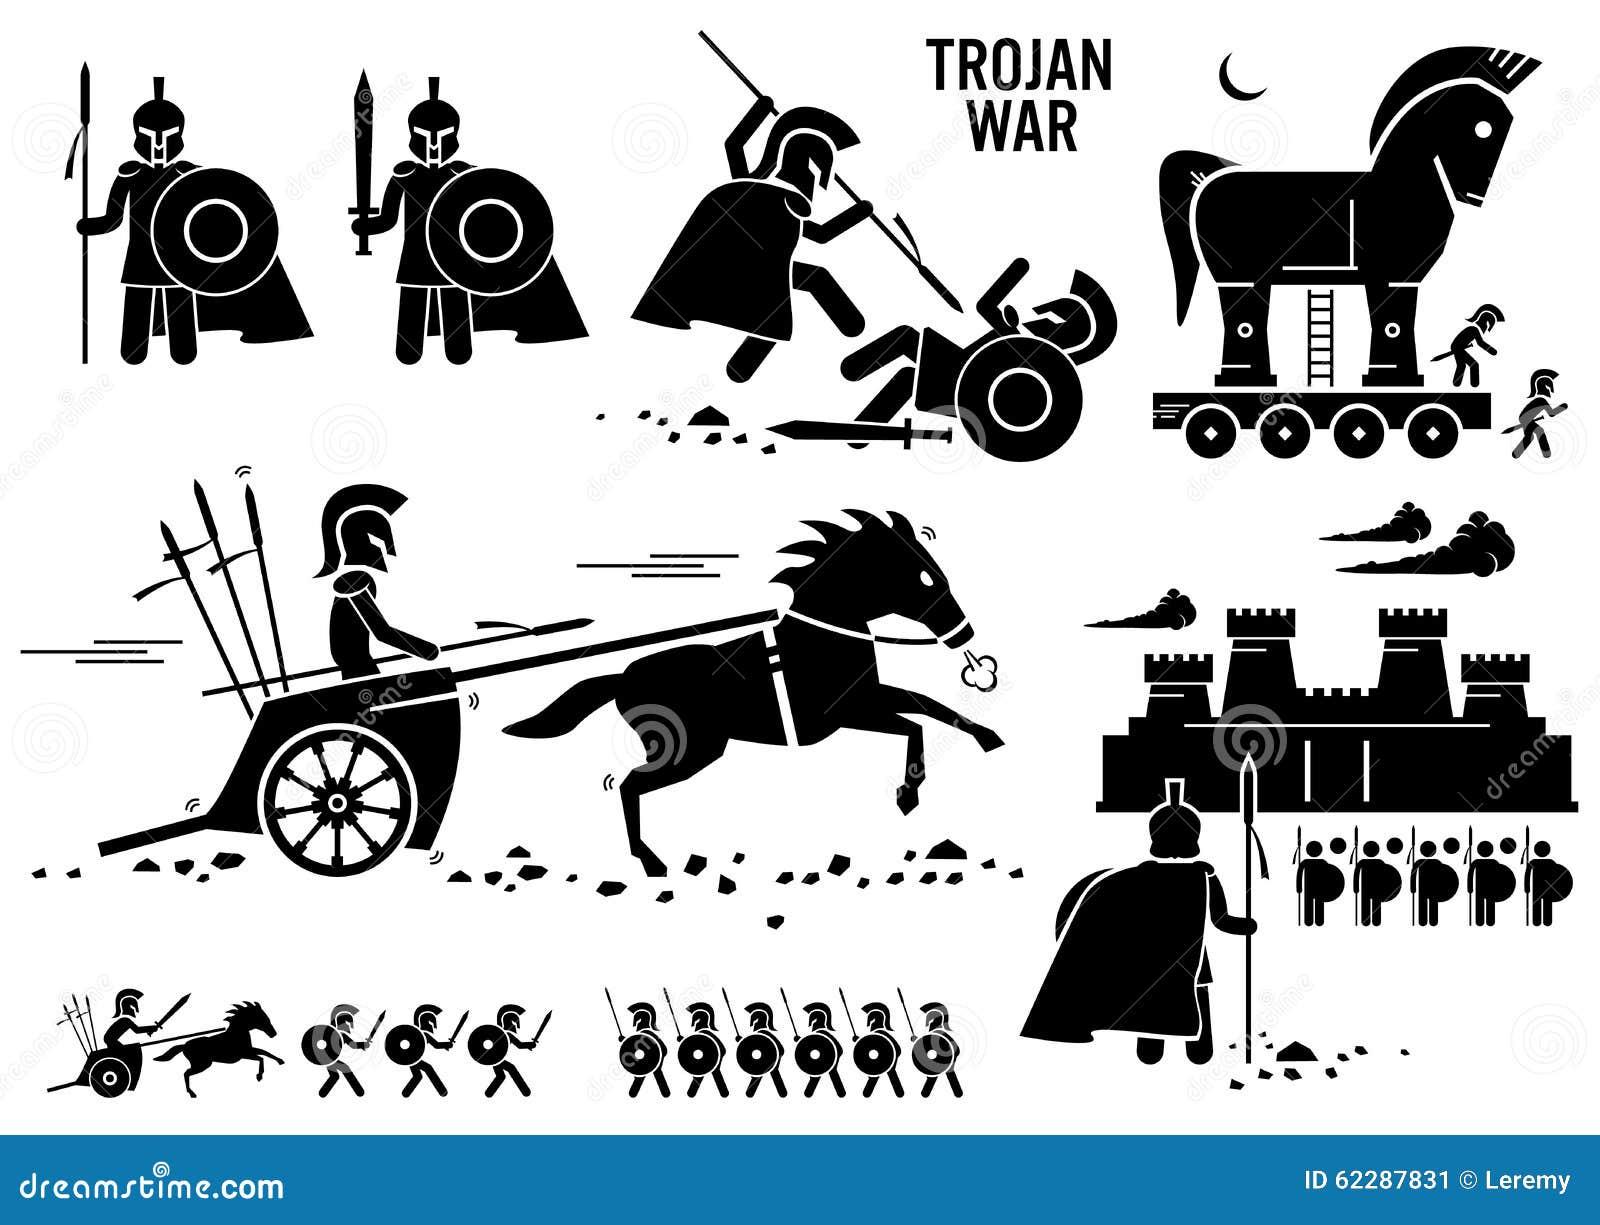 ... Troy Sparta Spartan Clipart de Rome de Grec de cheval de guerre Trojan